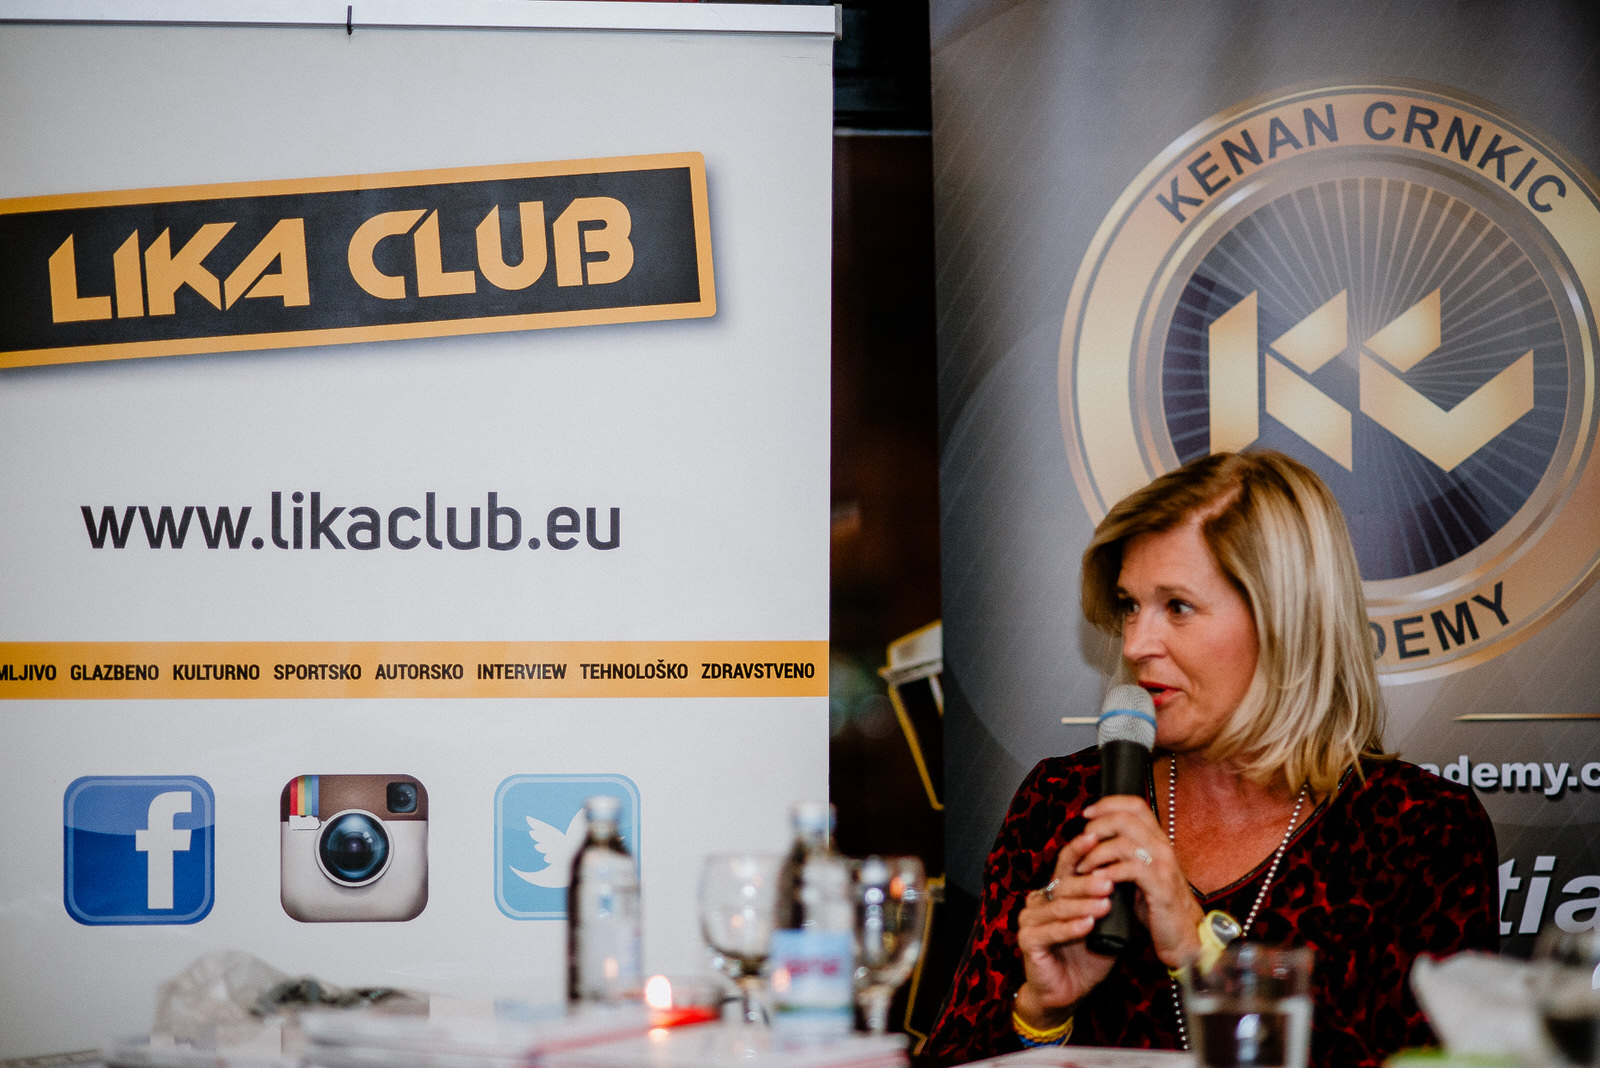 likaclub_otočac_book-caffe-paradisso_kenan-crnkić_2019-6